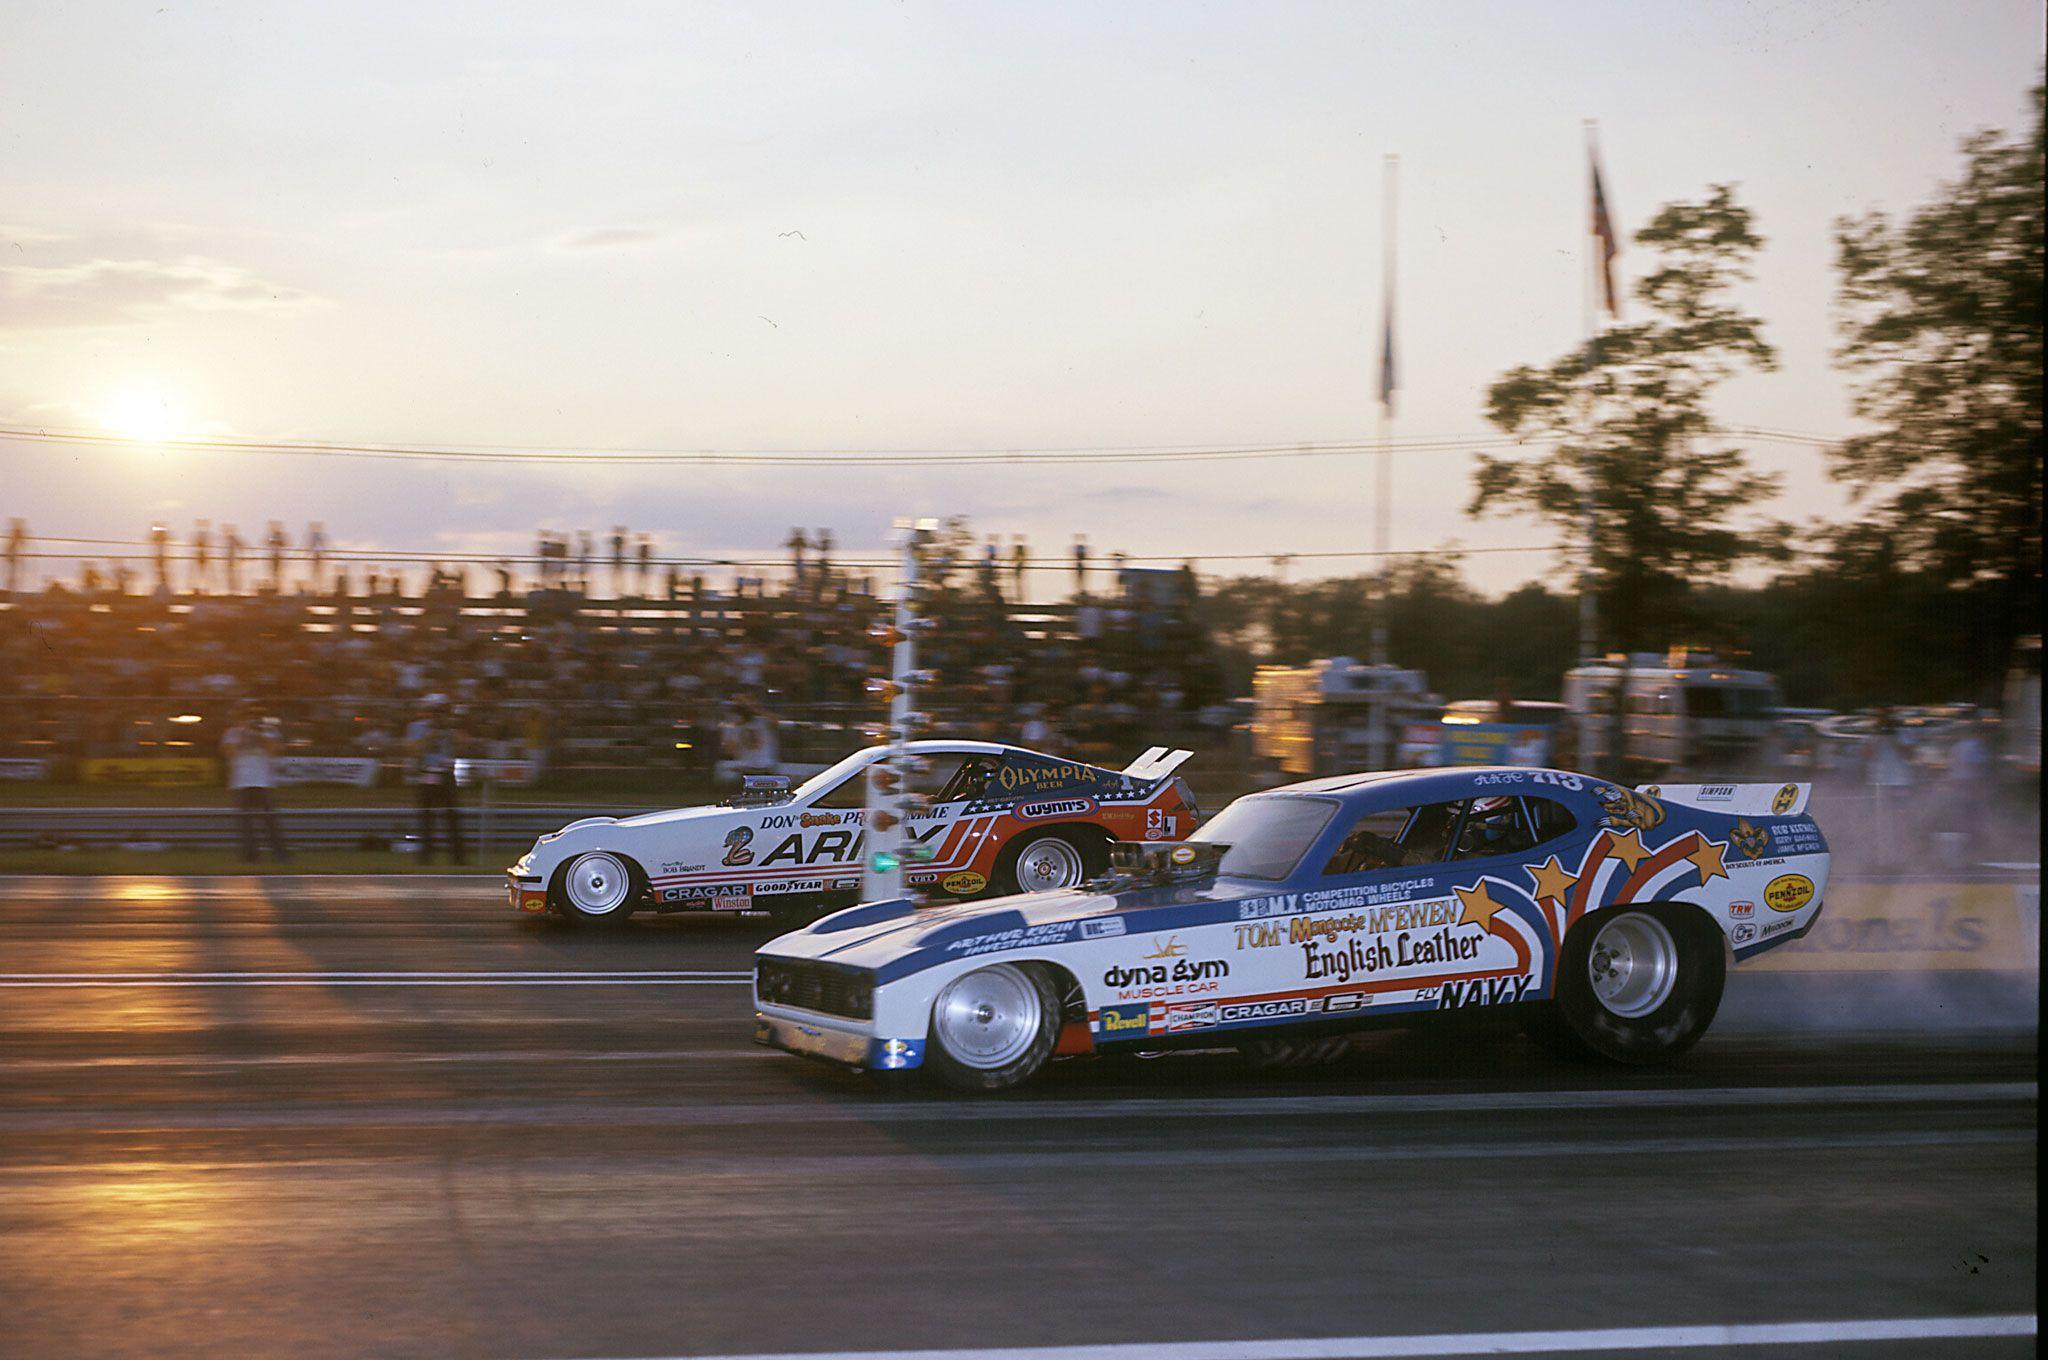 Vintage Drag Racing - Mongoose vs. The Snake Appreciated by Motorheads Performance www.musclecarssanantonio.com